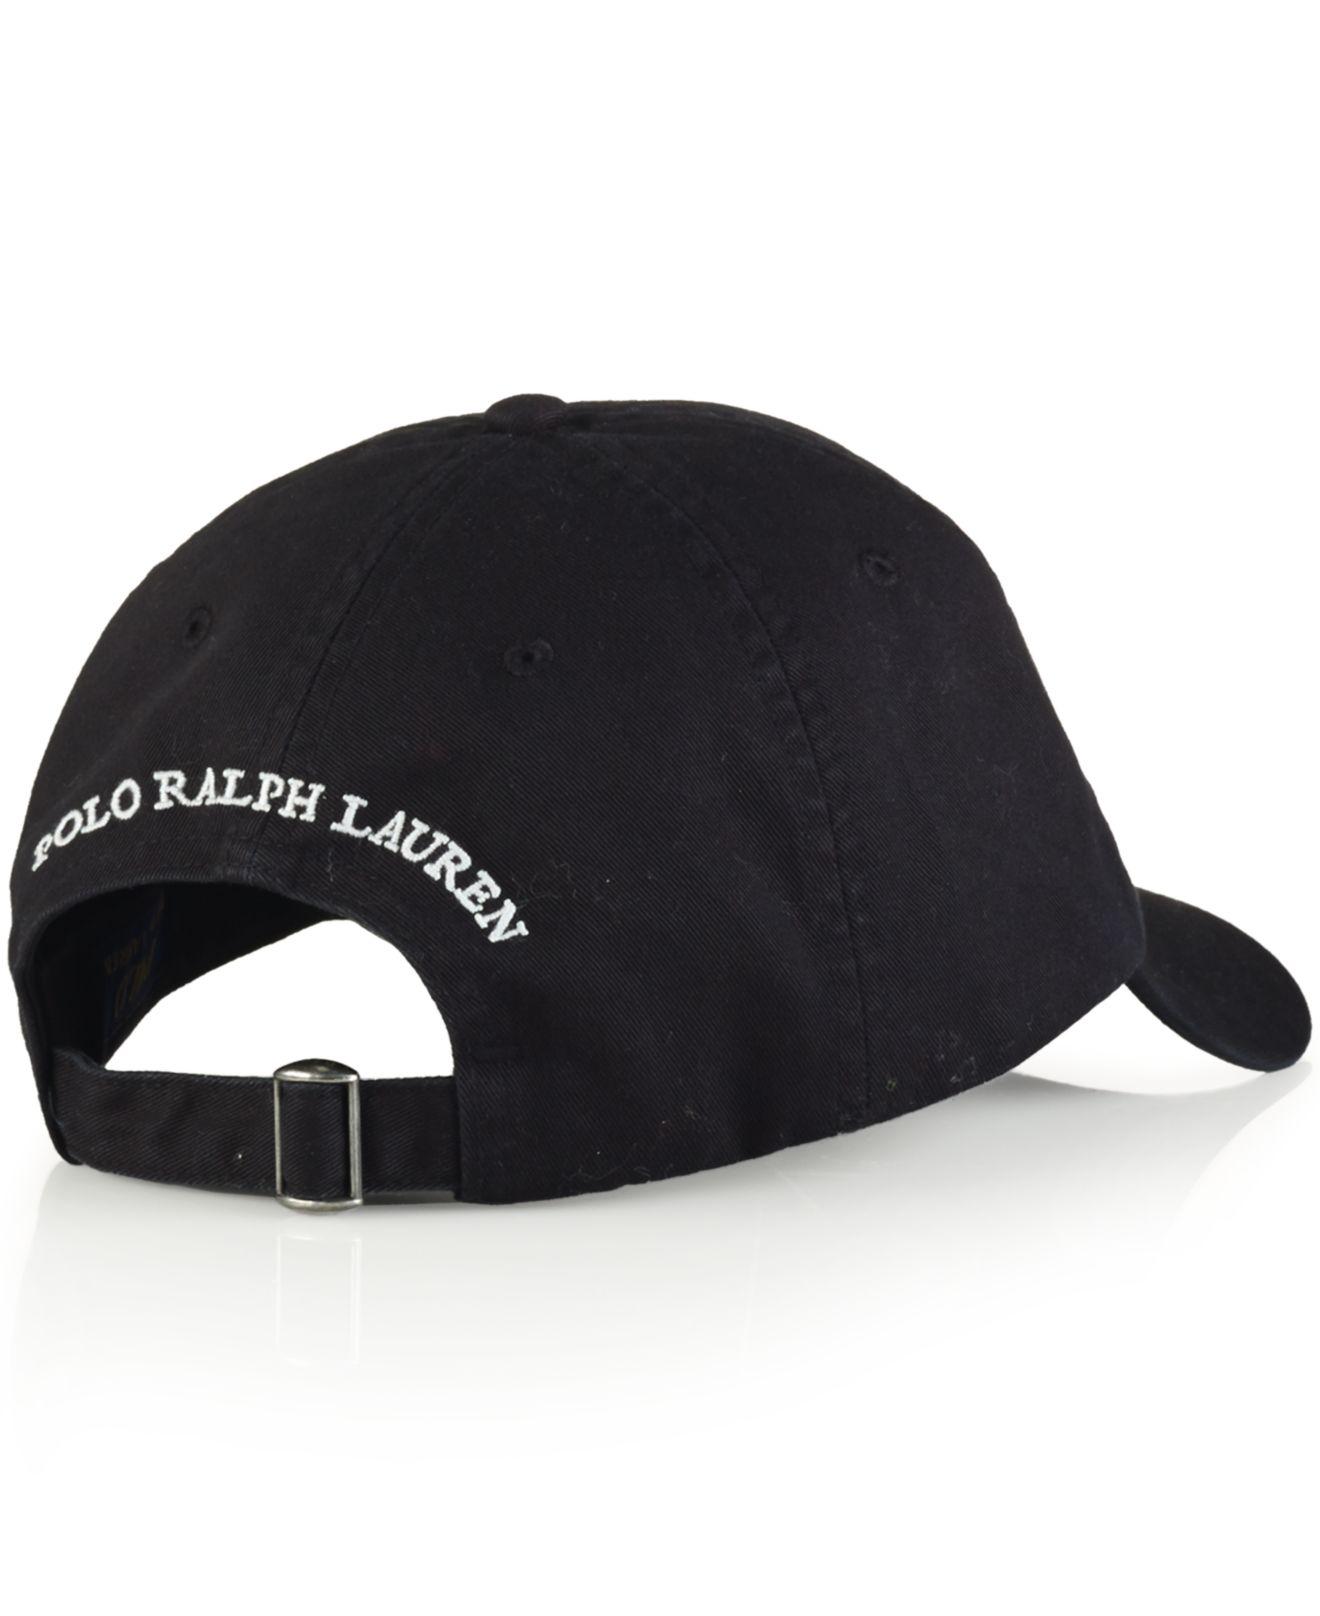 Lyst - Polo Ralph Lauren Polo Bear Chino Baseball Cap - Athlete Bear ... eda13a58b0f0